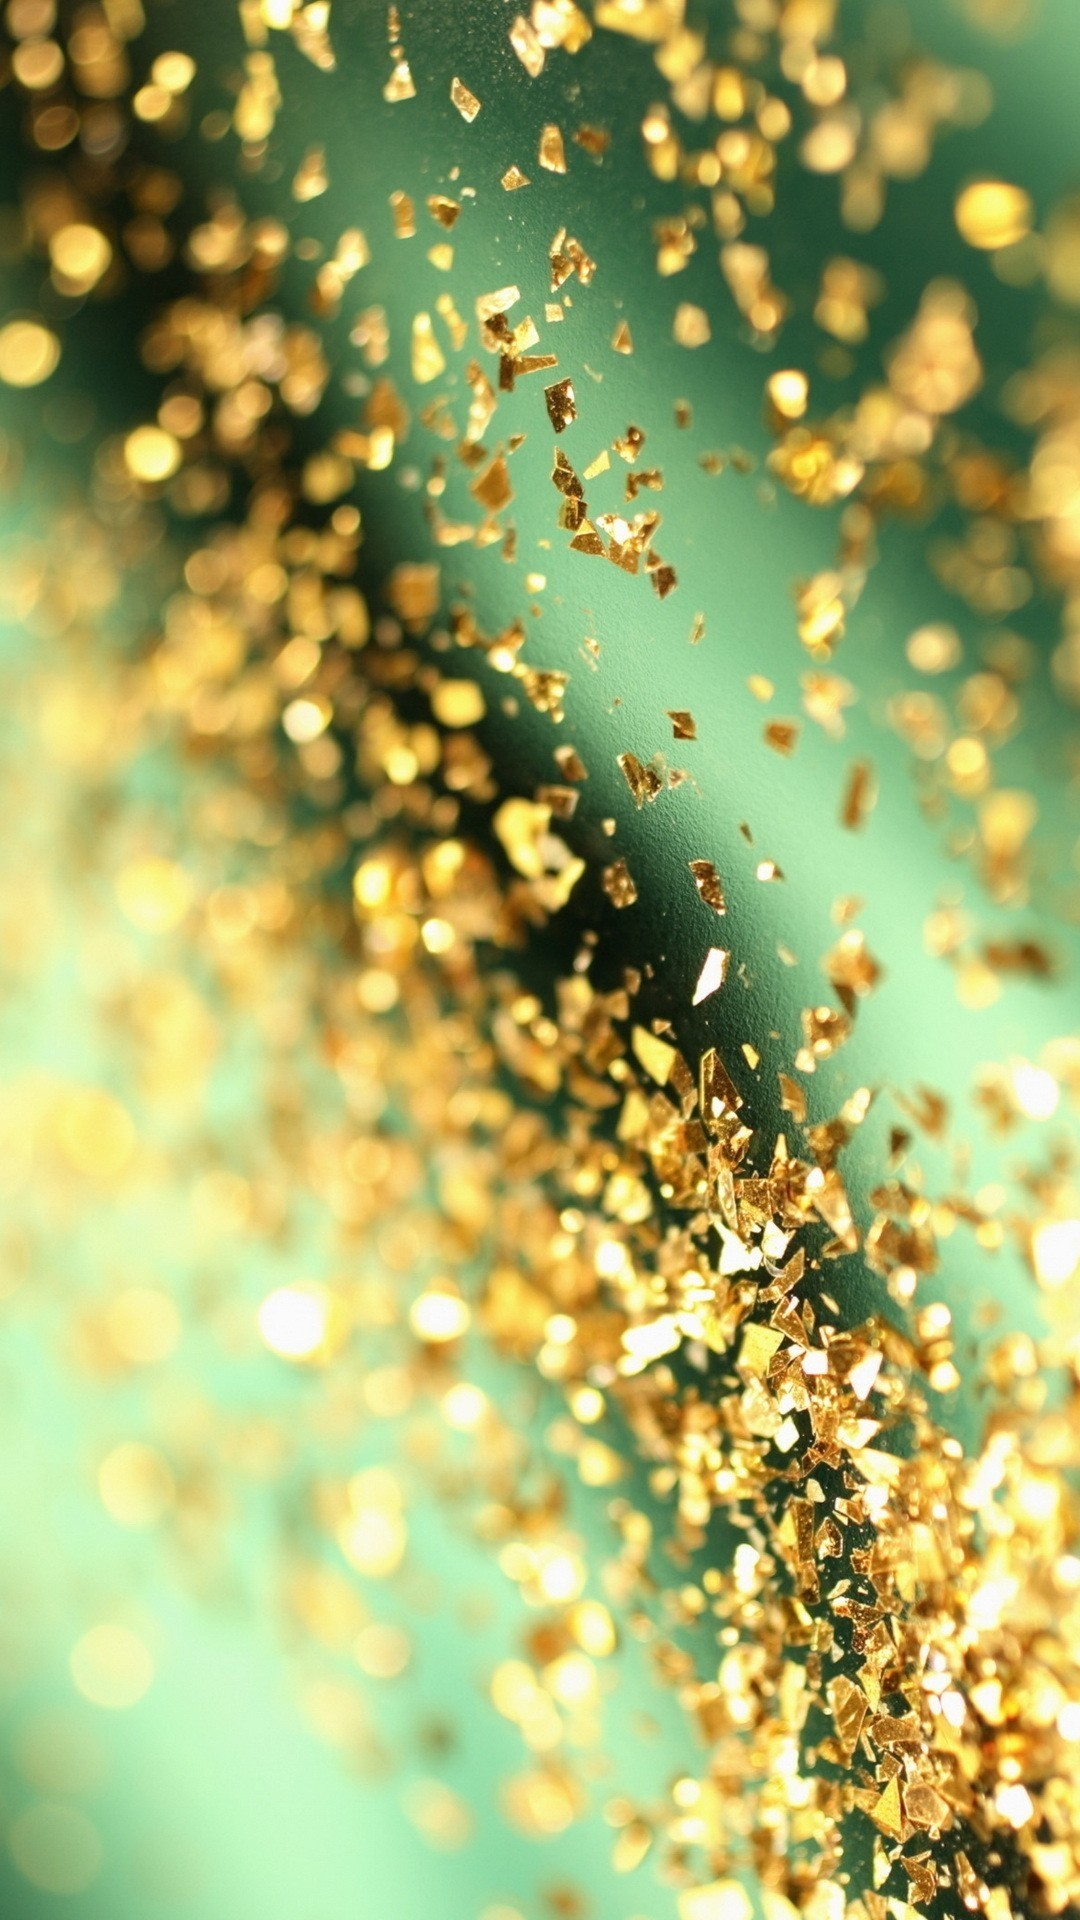 Glitter iPhone hd wallpaper